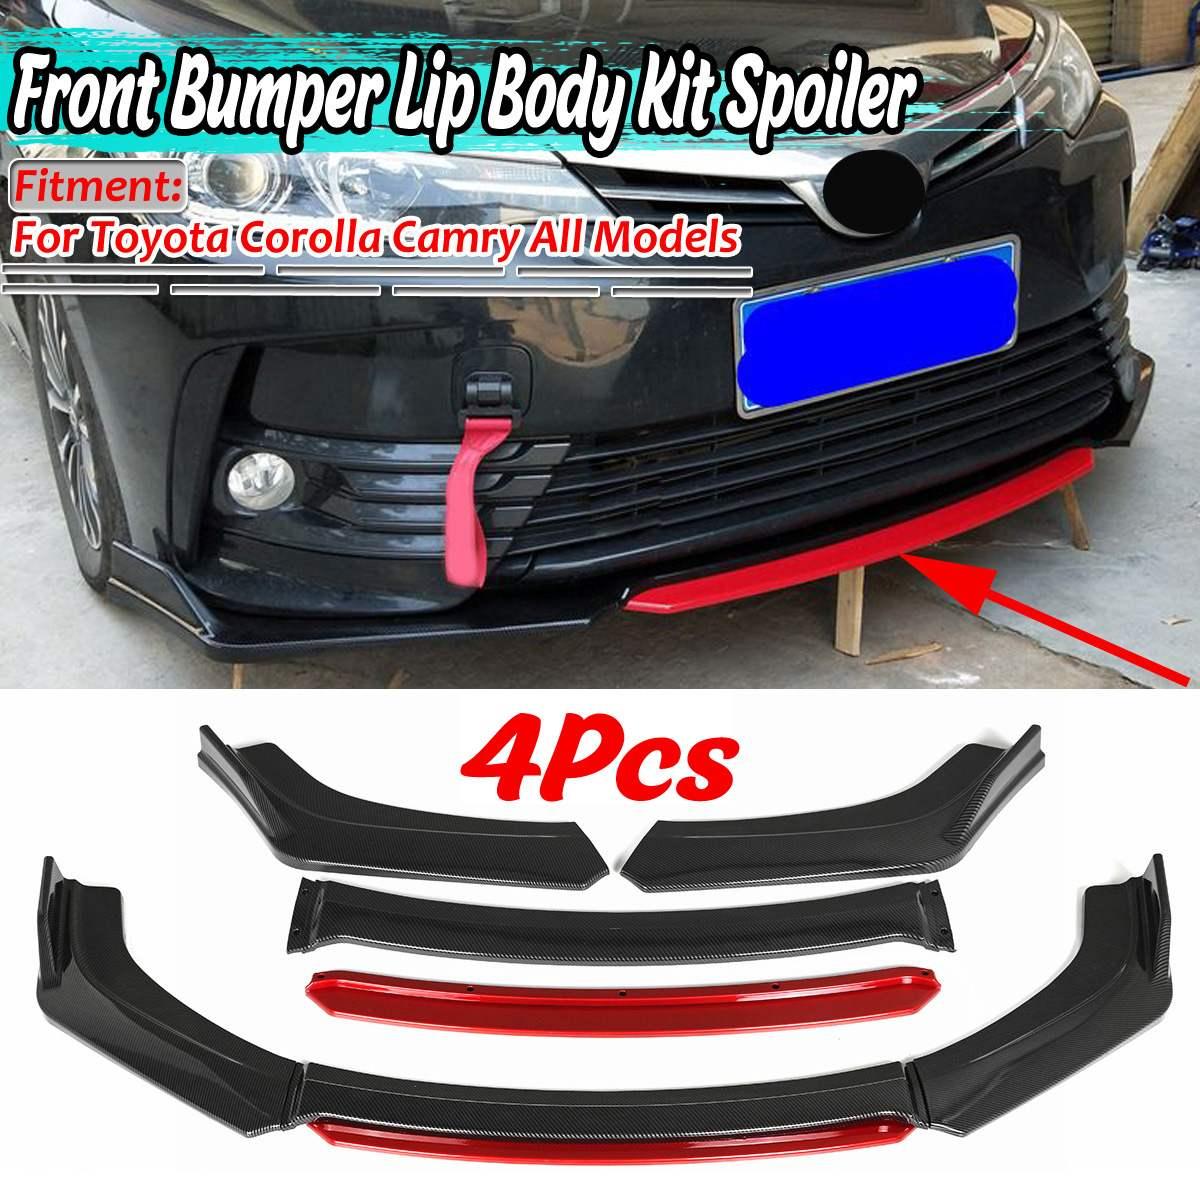 Universal 4pc Car Front Bumper Splitter Lip Diffuser Spoiler For VW Golf MK5 MK6 MK7 For Toyota Corolla Camry For Subaru For Kia